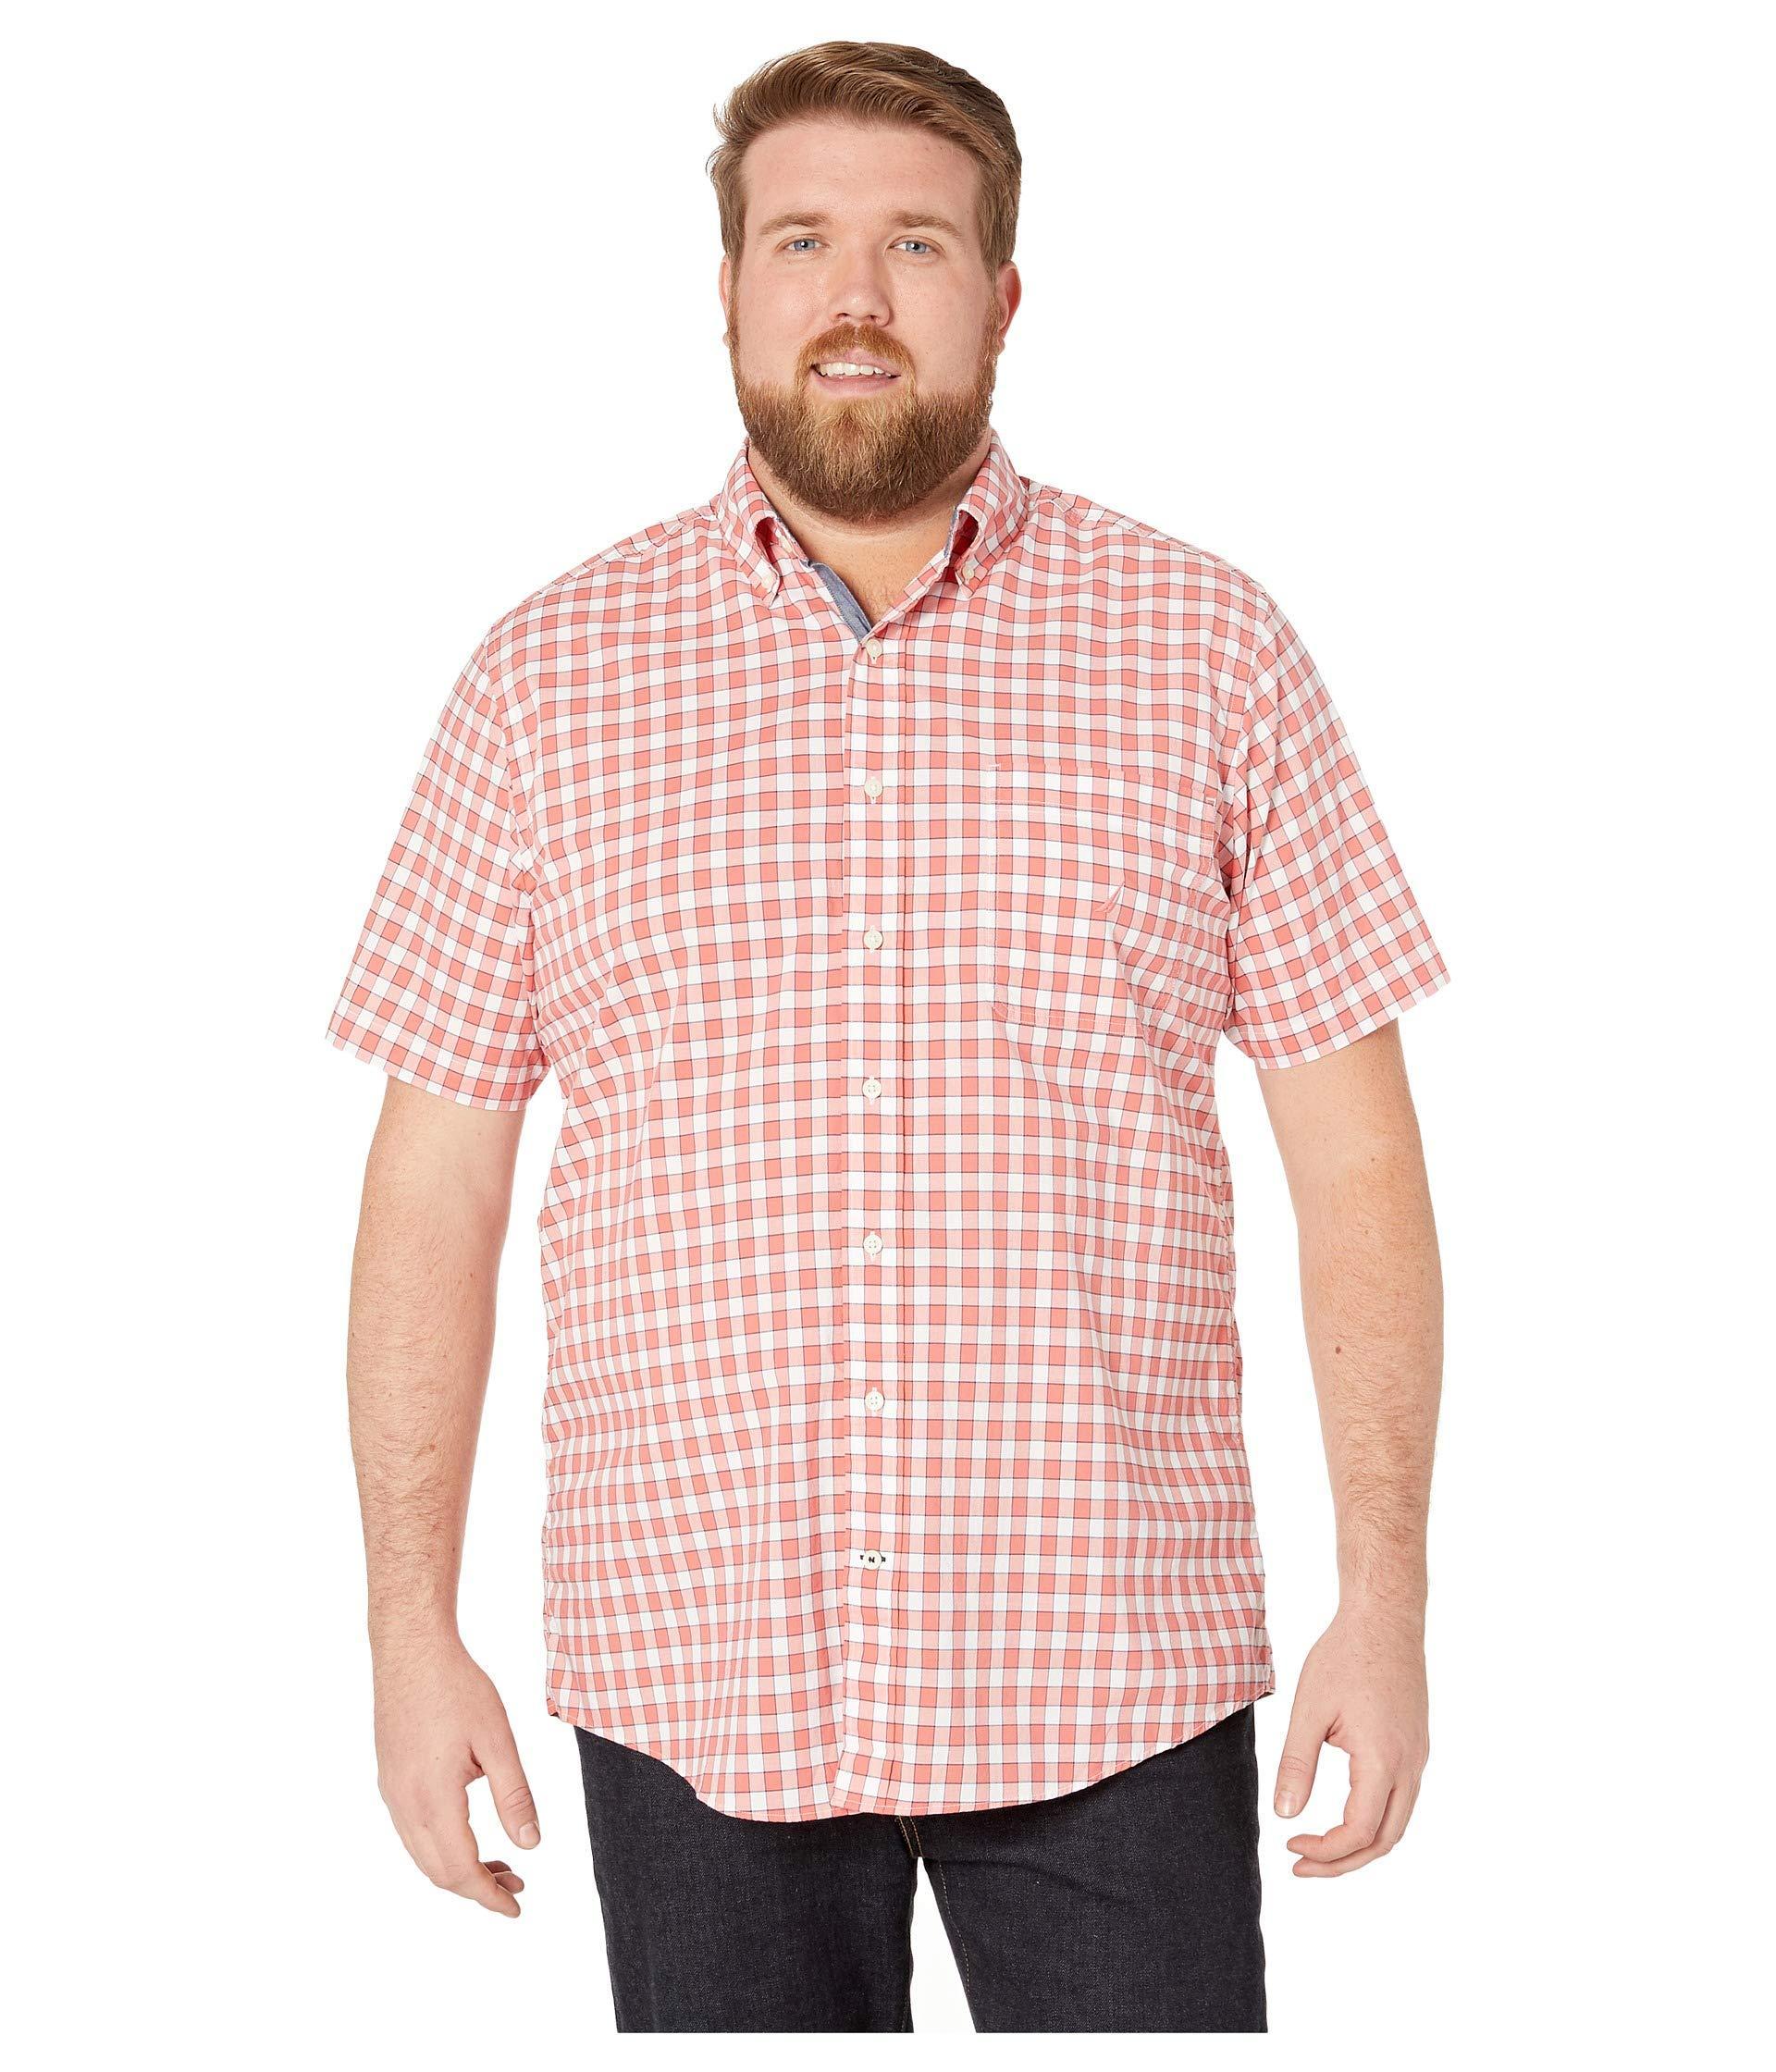 2a3b82bc9 Big And Tall Mens A Shirts - DREAMWORKS